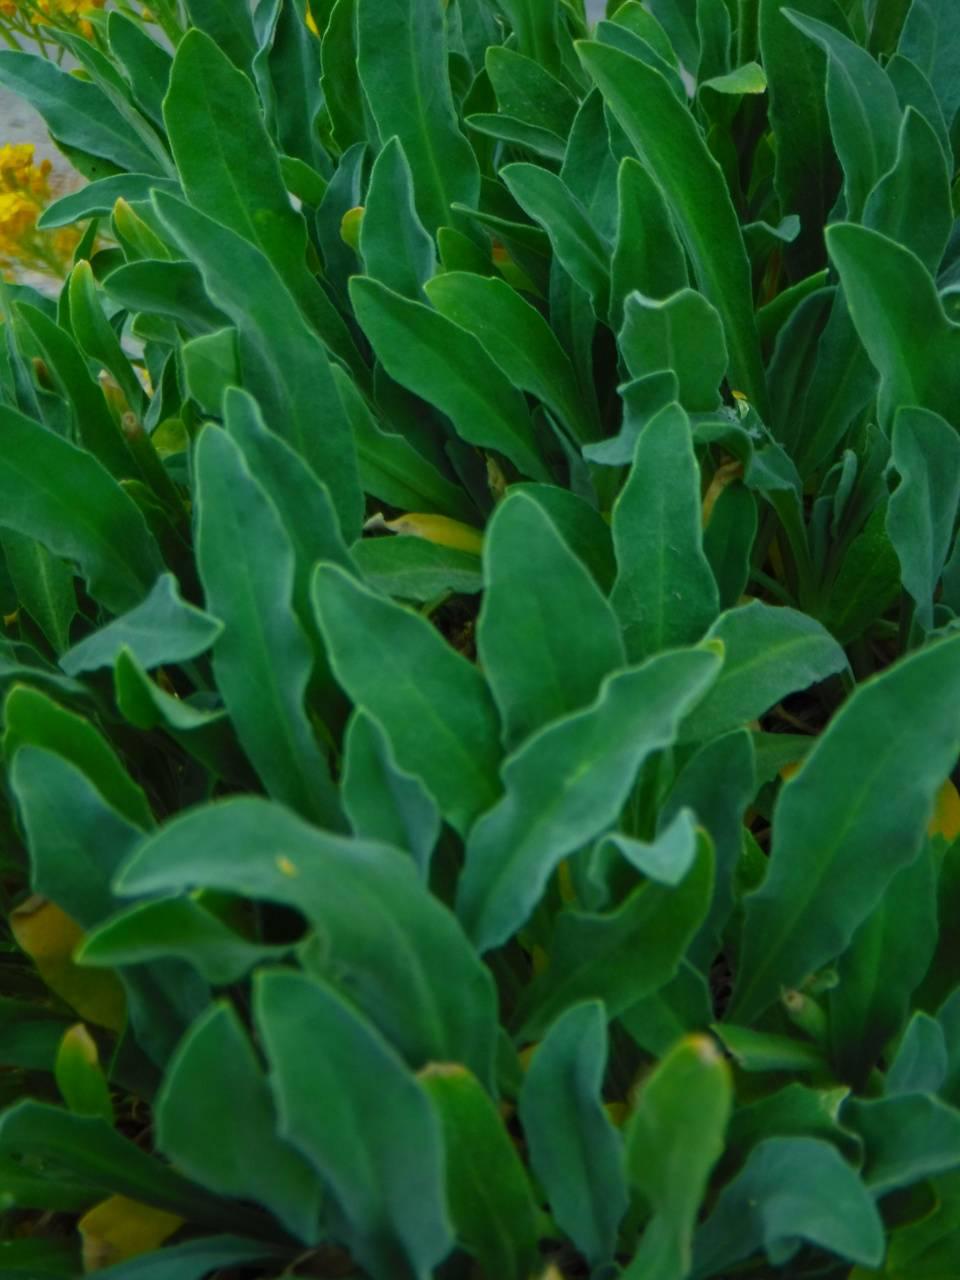 Spring green leaved